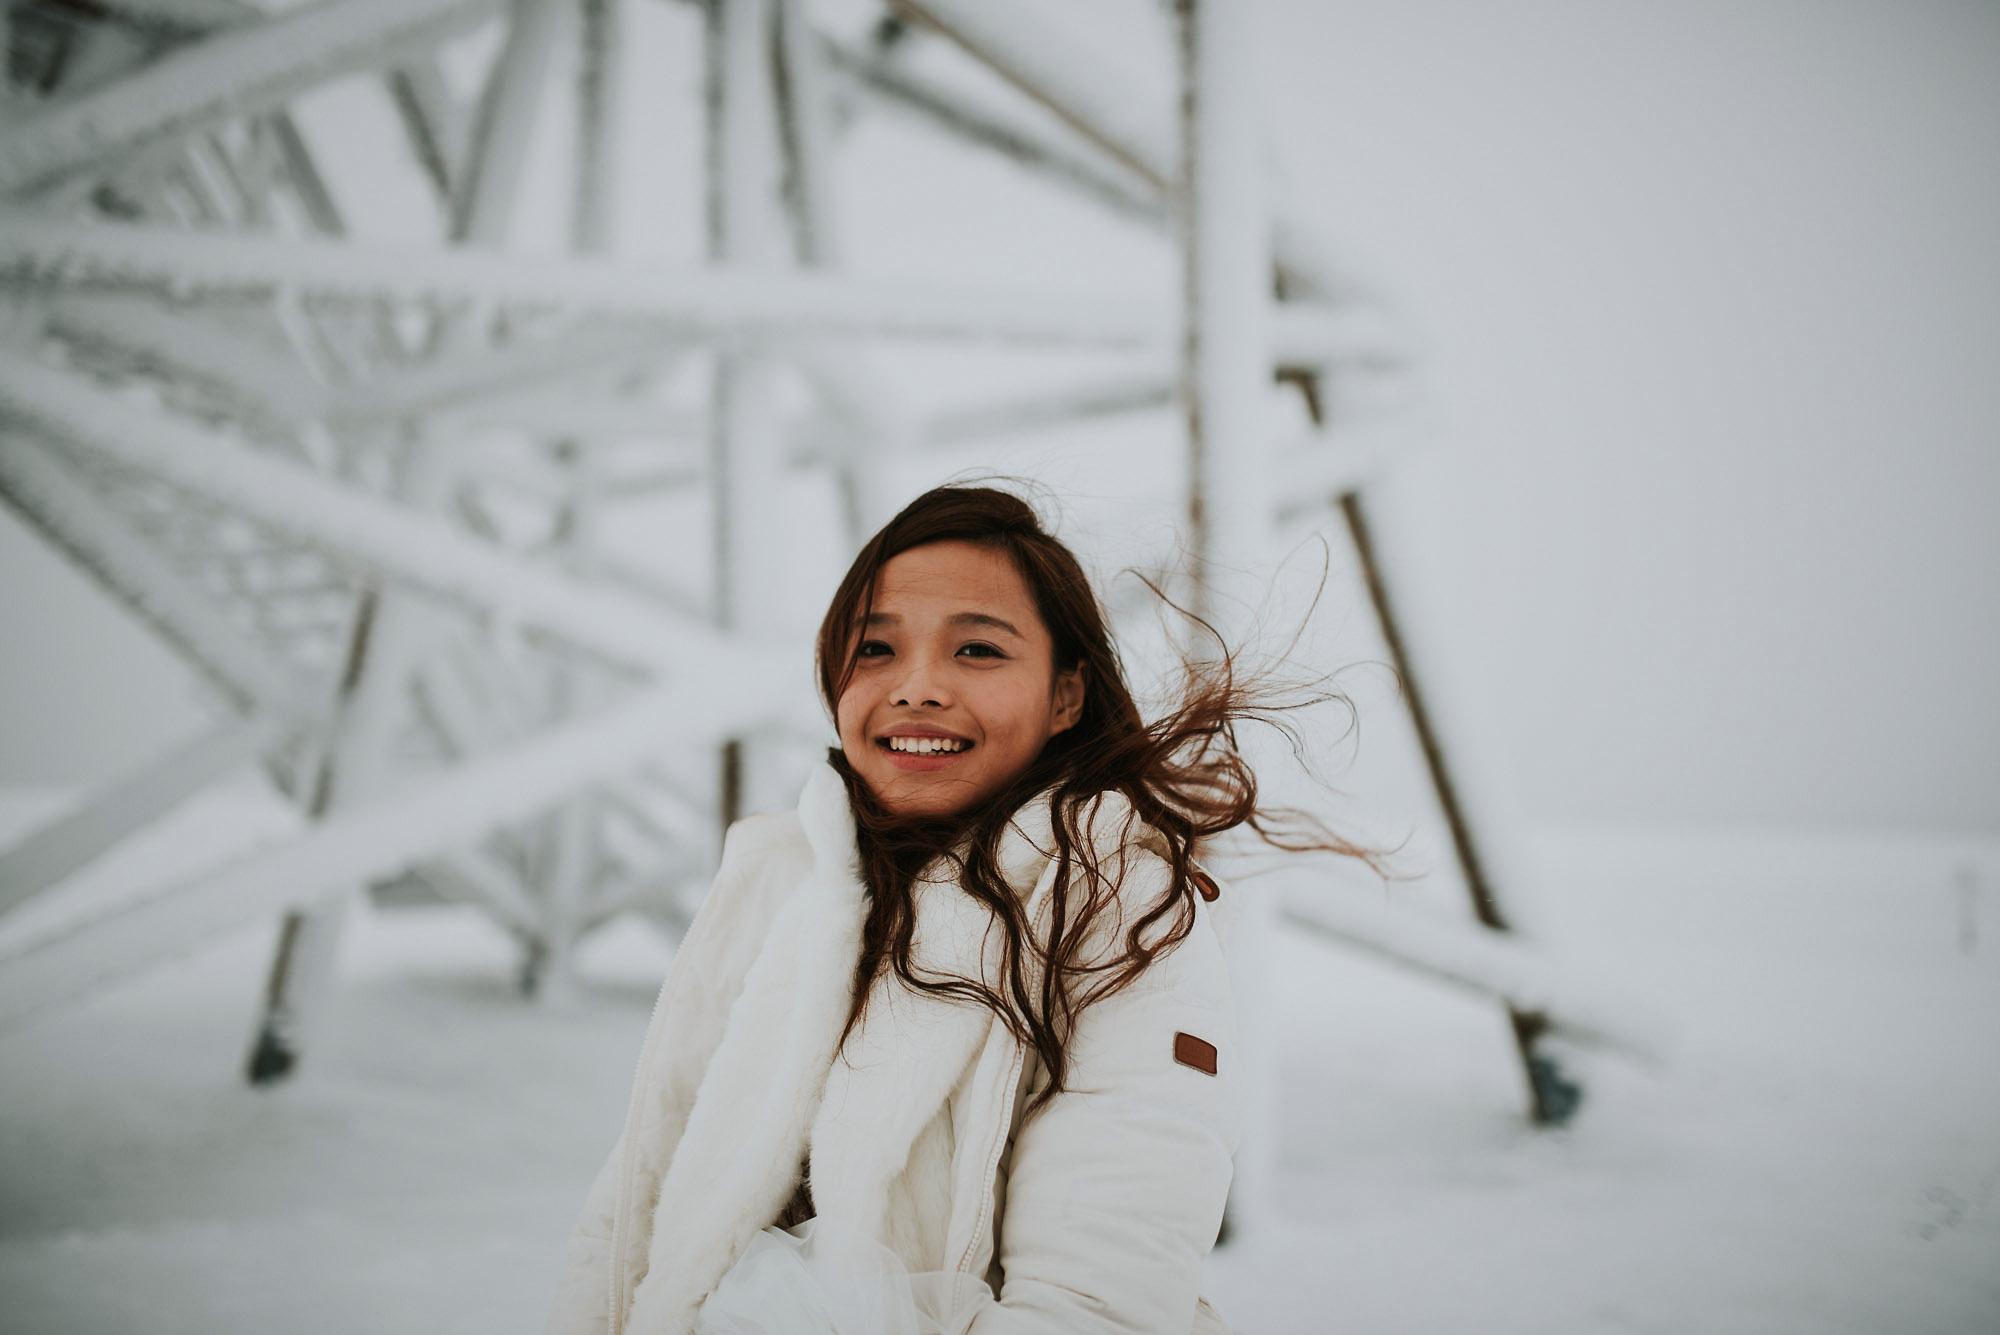 levi-ice-chapel-weddings-lapland-finland-photographer-jere-satamo-019-blog.jpg